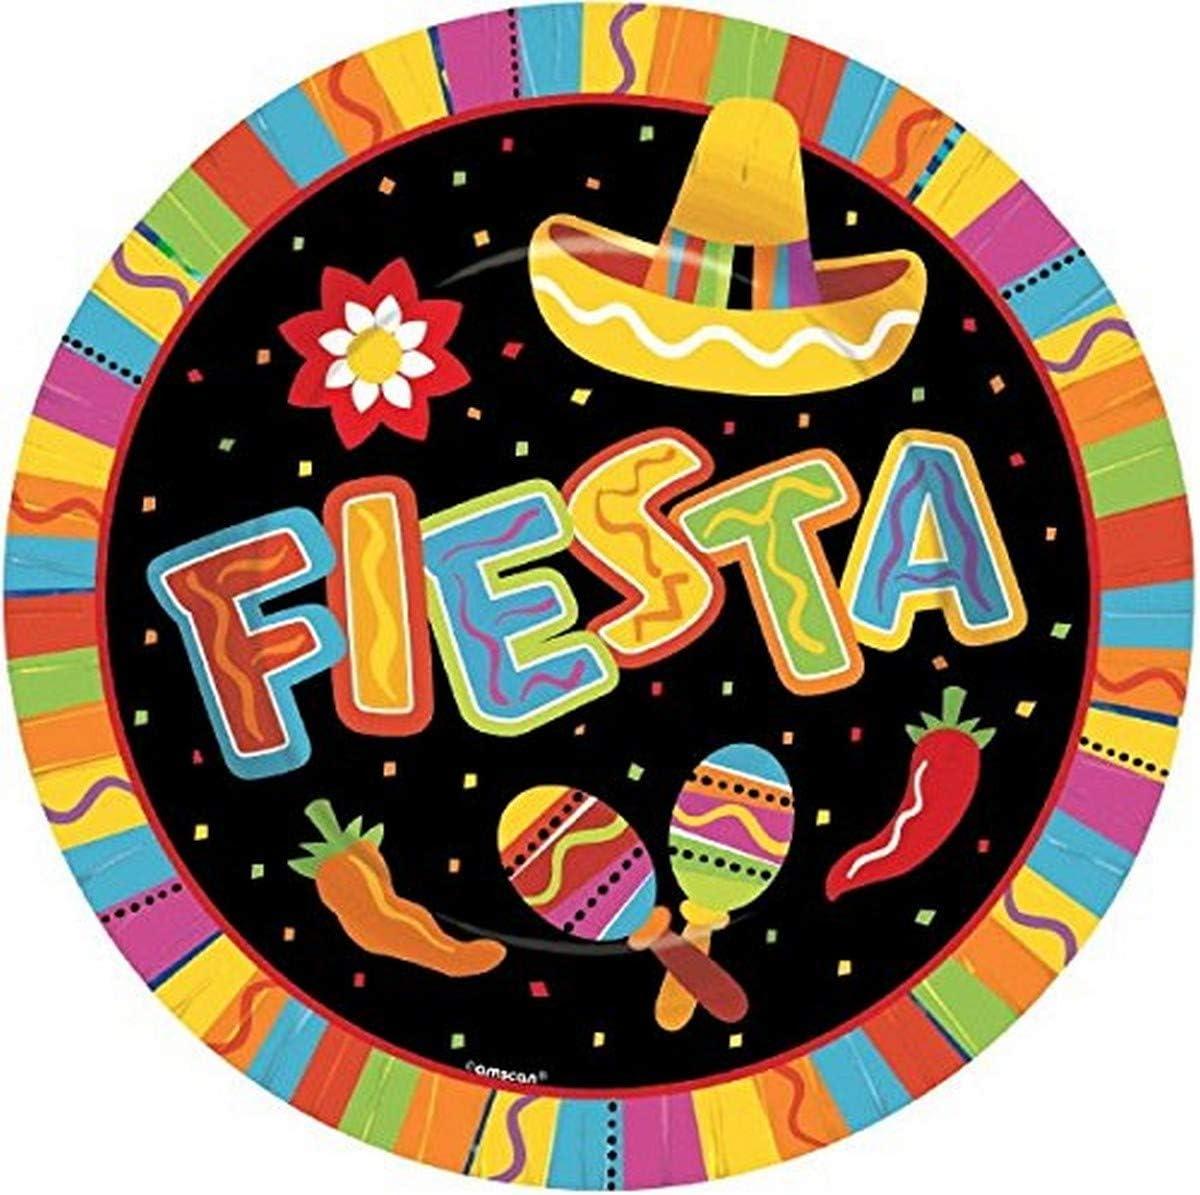 Fiesta Cinco De Mayo Party Round Dinner Plates, 8 Ct.   Party Tableware